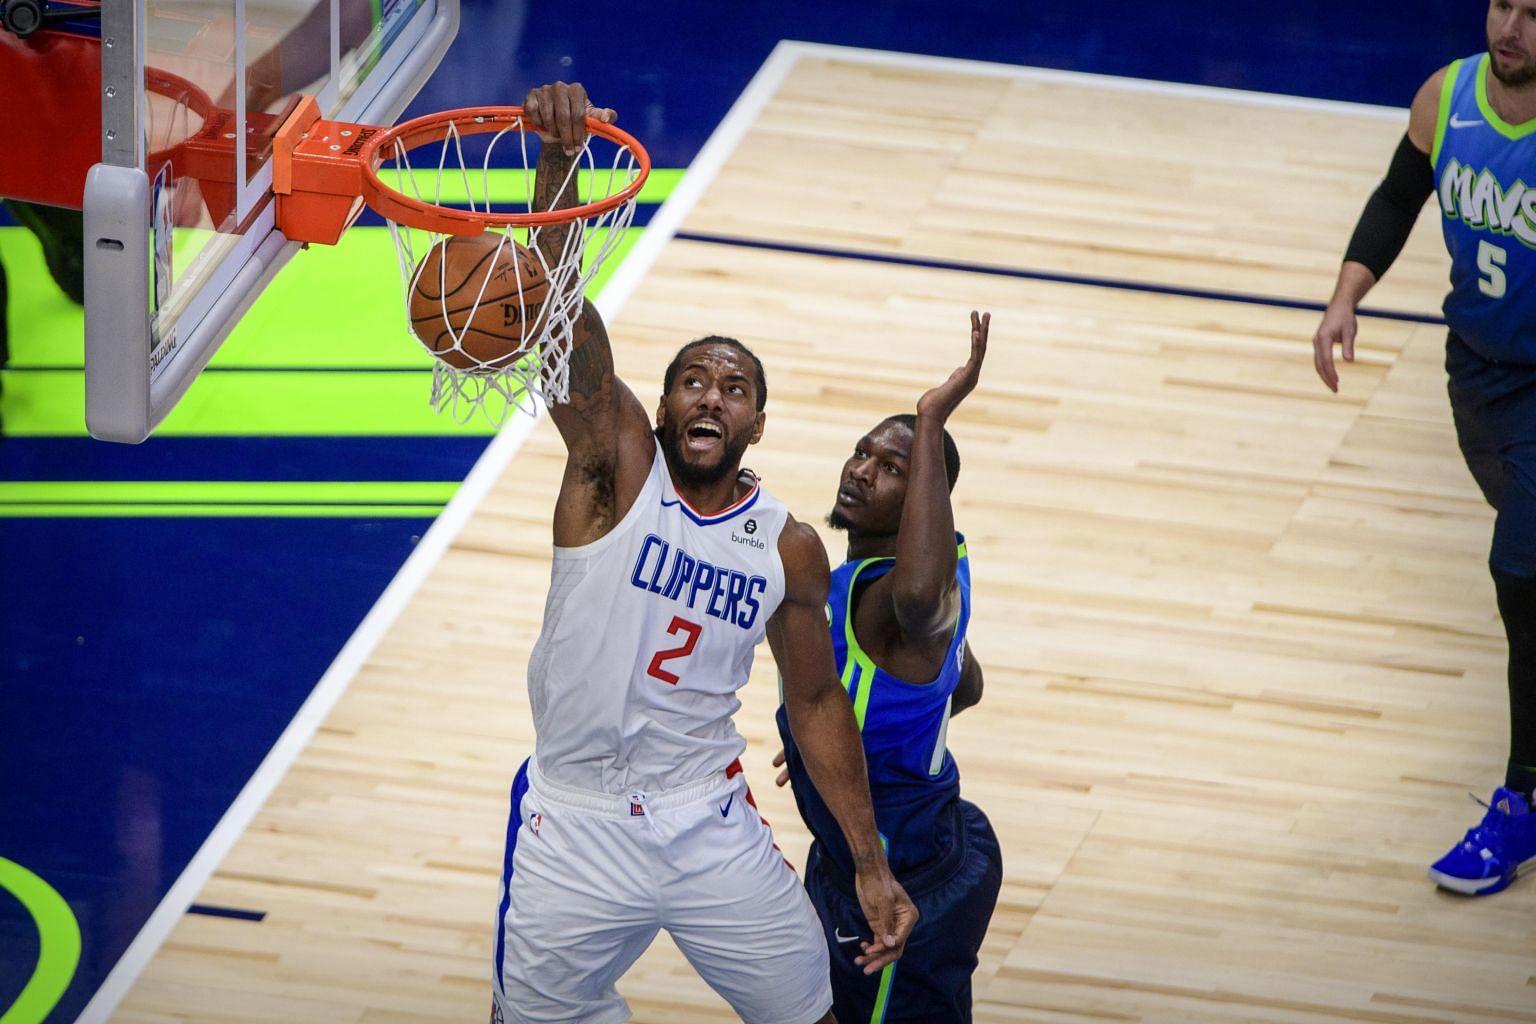 Nba Kawhi Leonard Paul George Lead La Clippers In Win Over